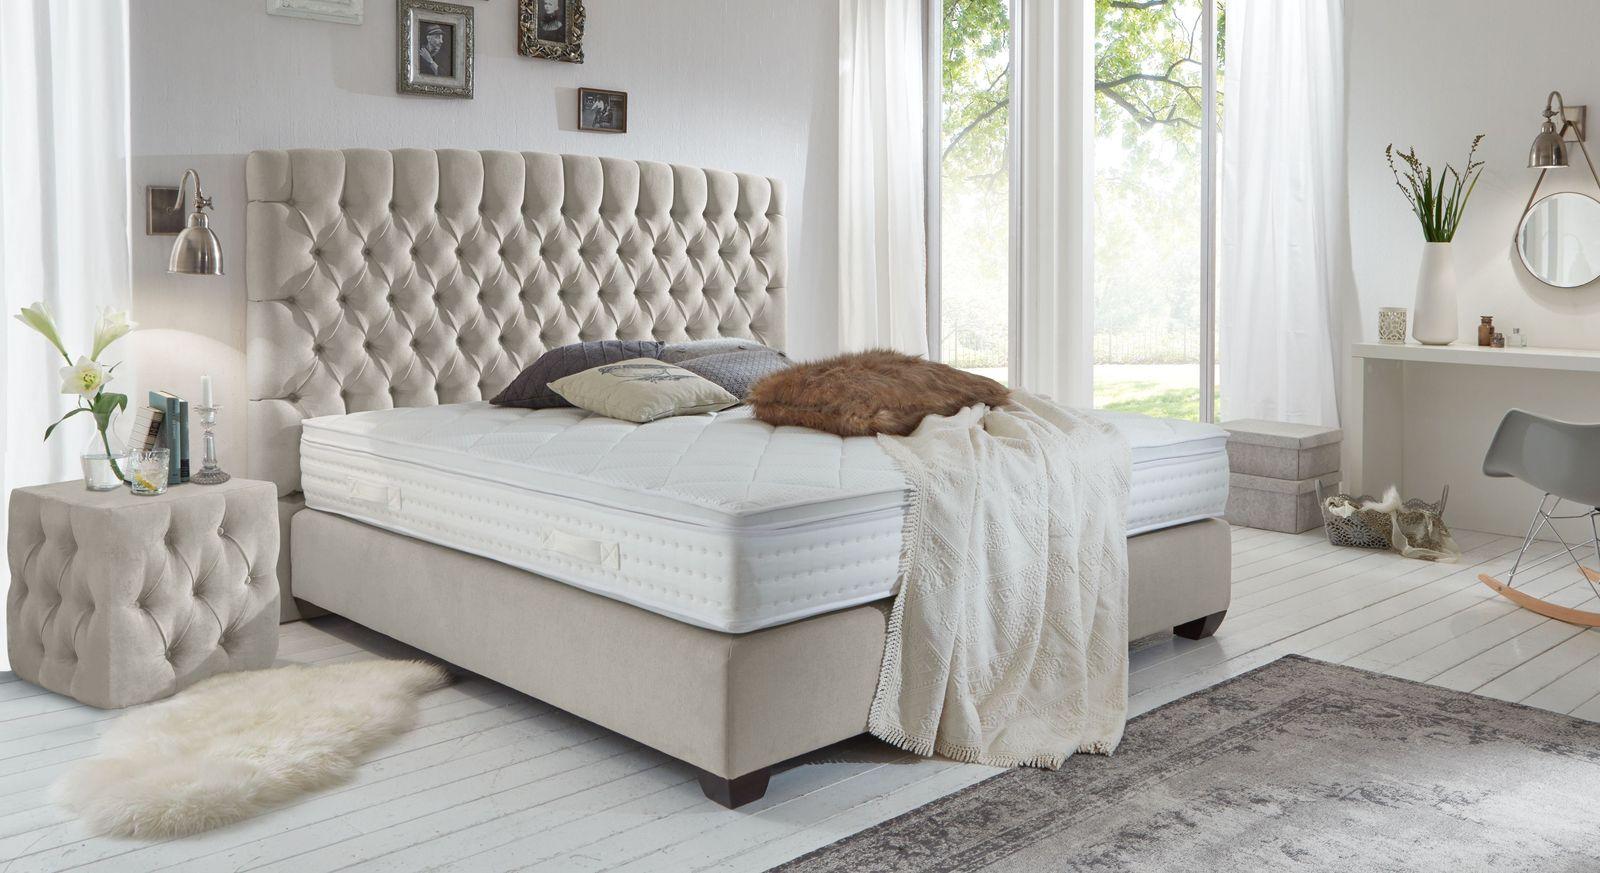 royales boxspringbett im englischen chesterfield design palmdale. Black Bedroom Furniture Sets. Home Design Ideas